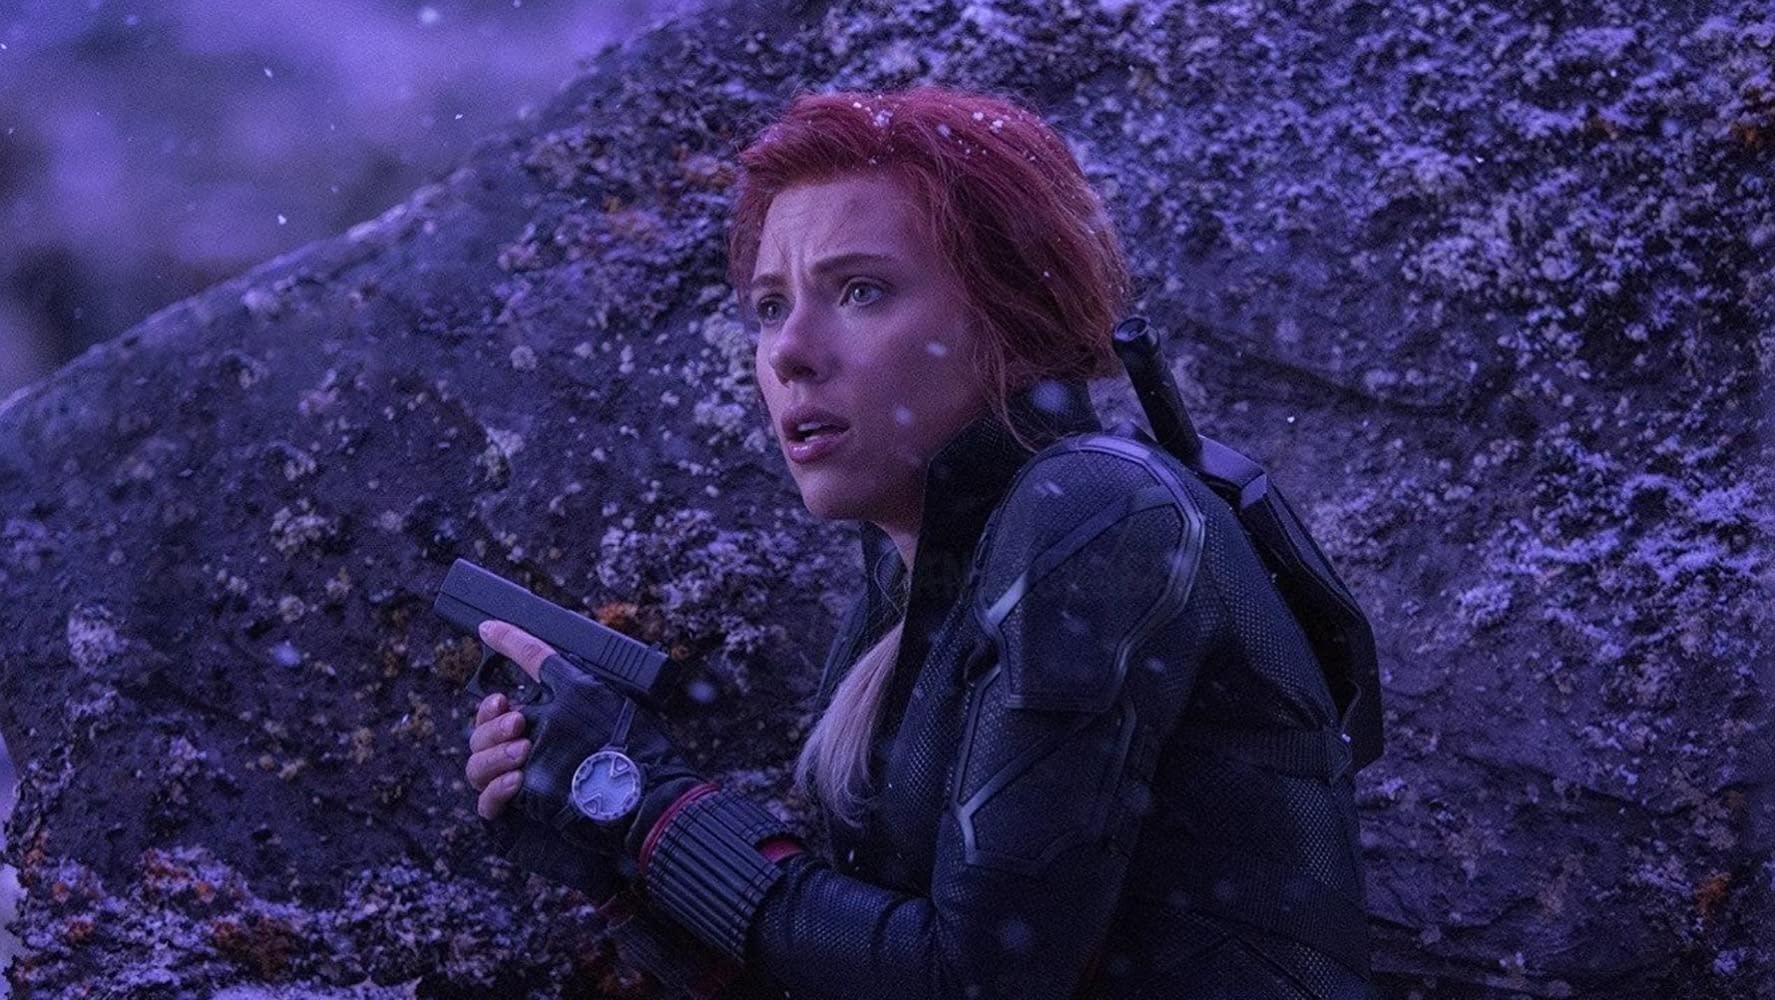 Black Widow S Original Avengers Endgame Death Released